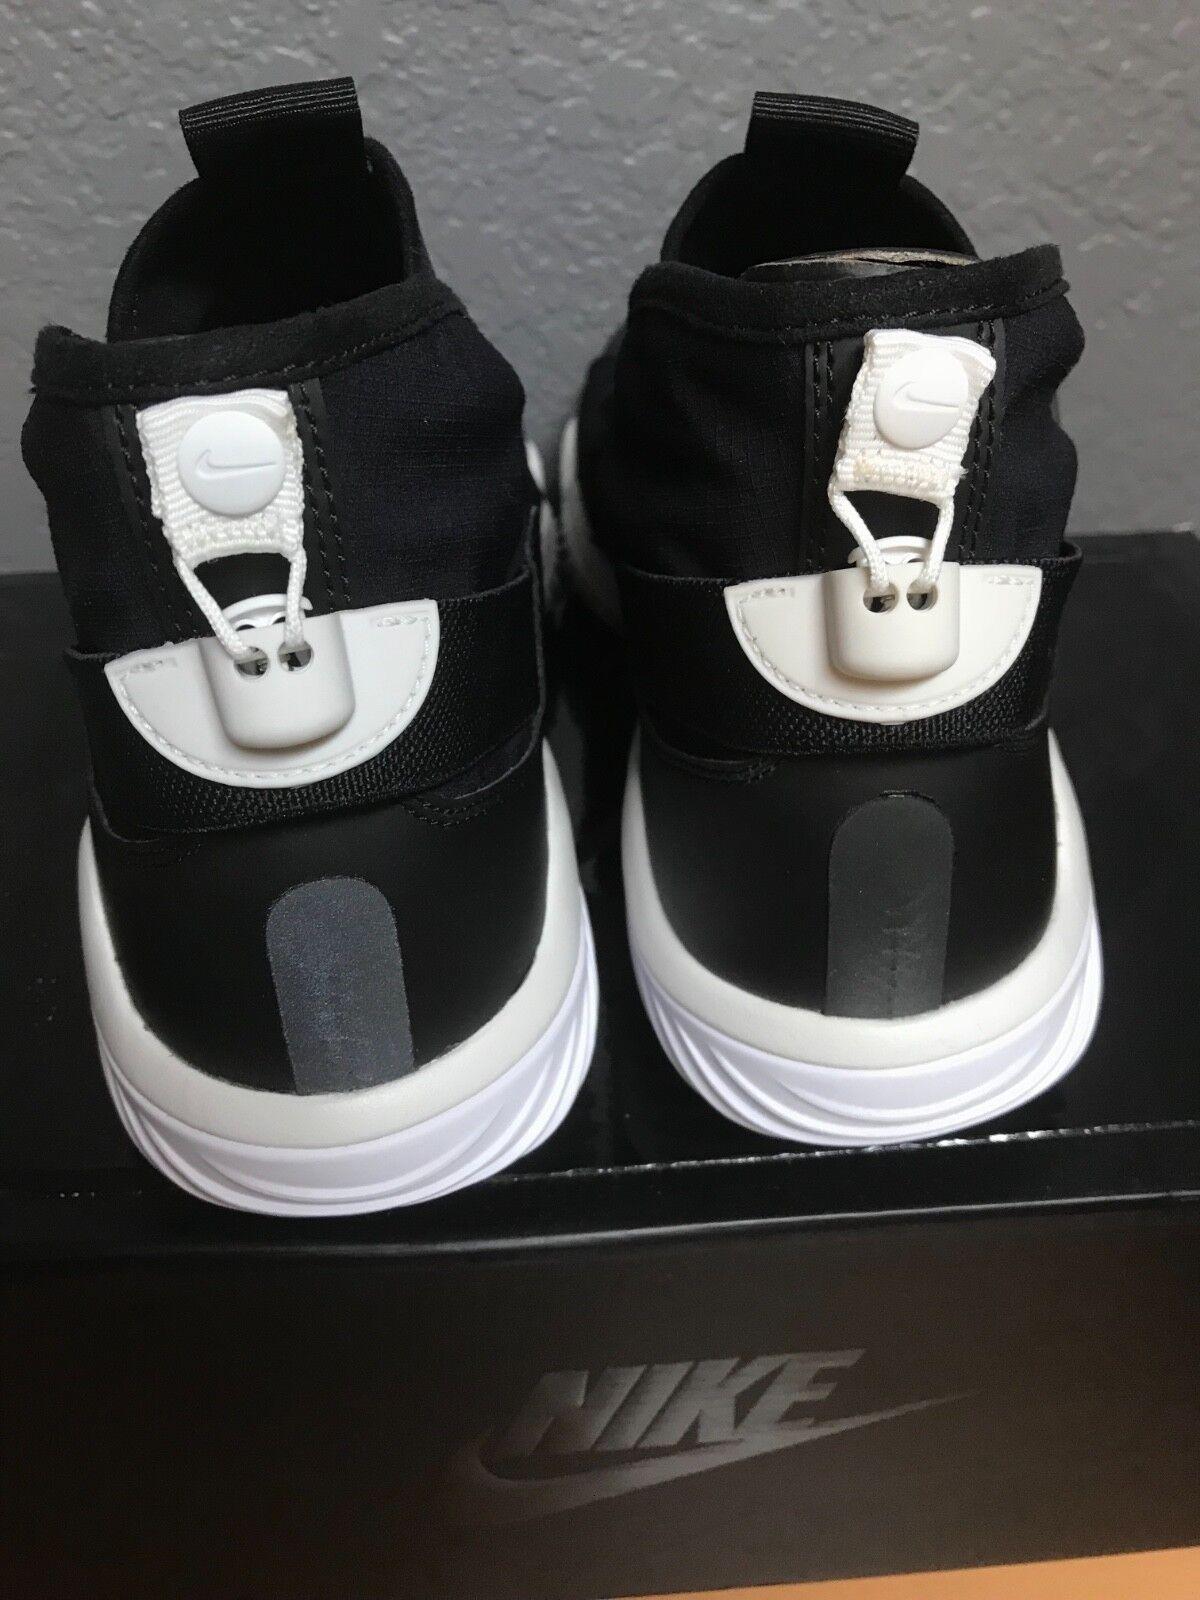 Nike Schuhe - schuhe Erschwingliche Schuhe Nike für jeden Anlass 2625b4